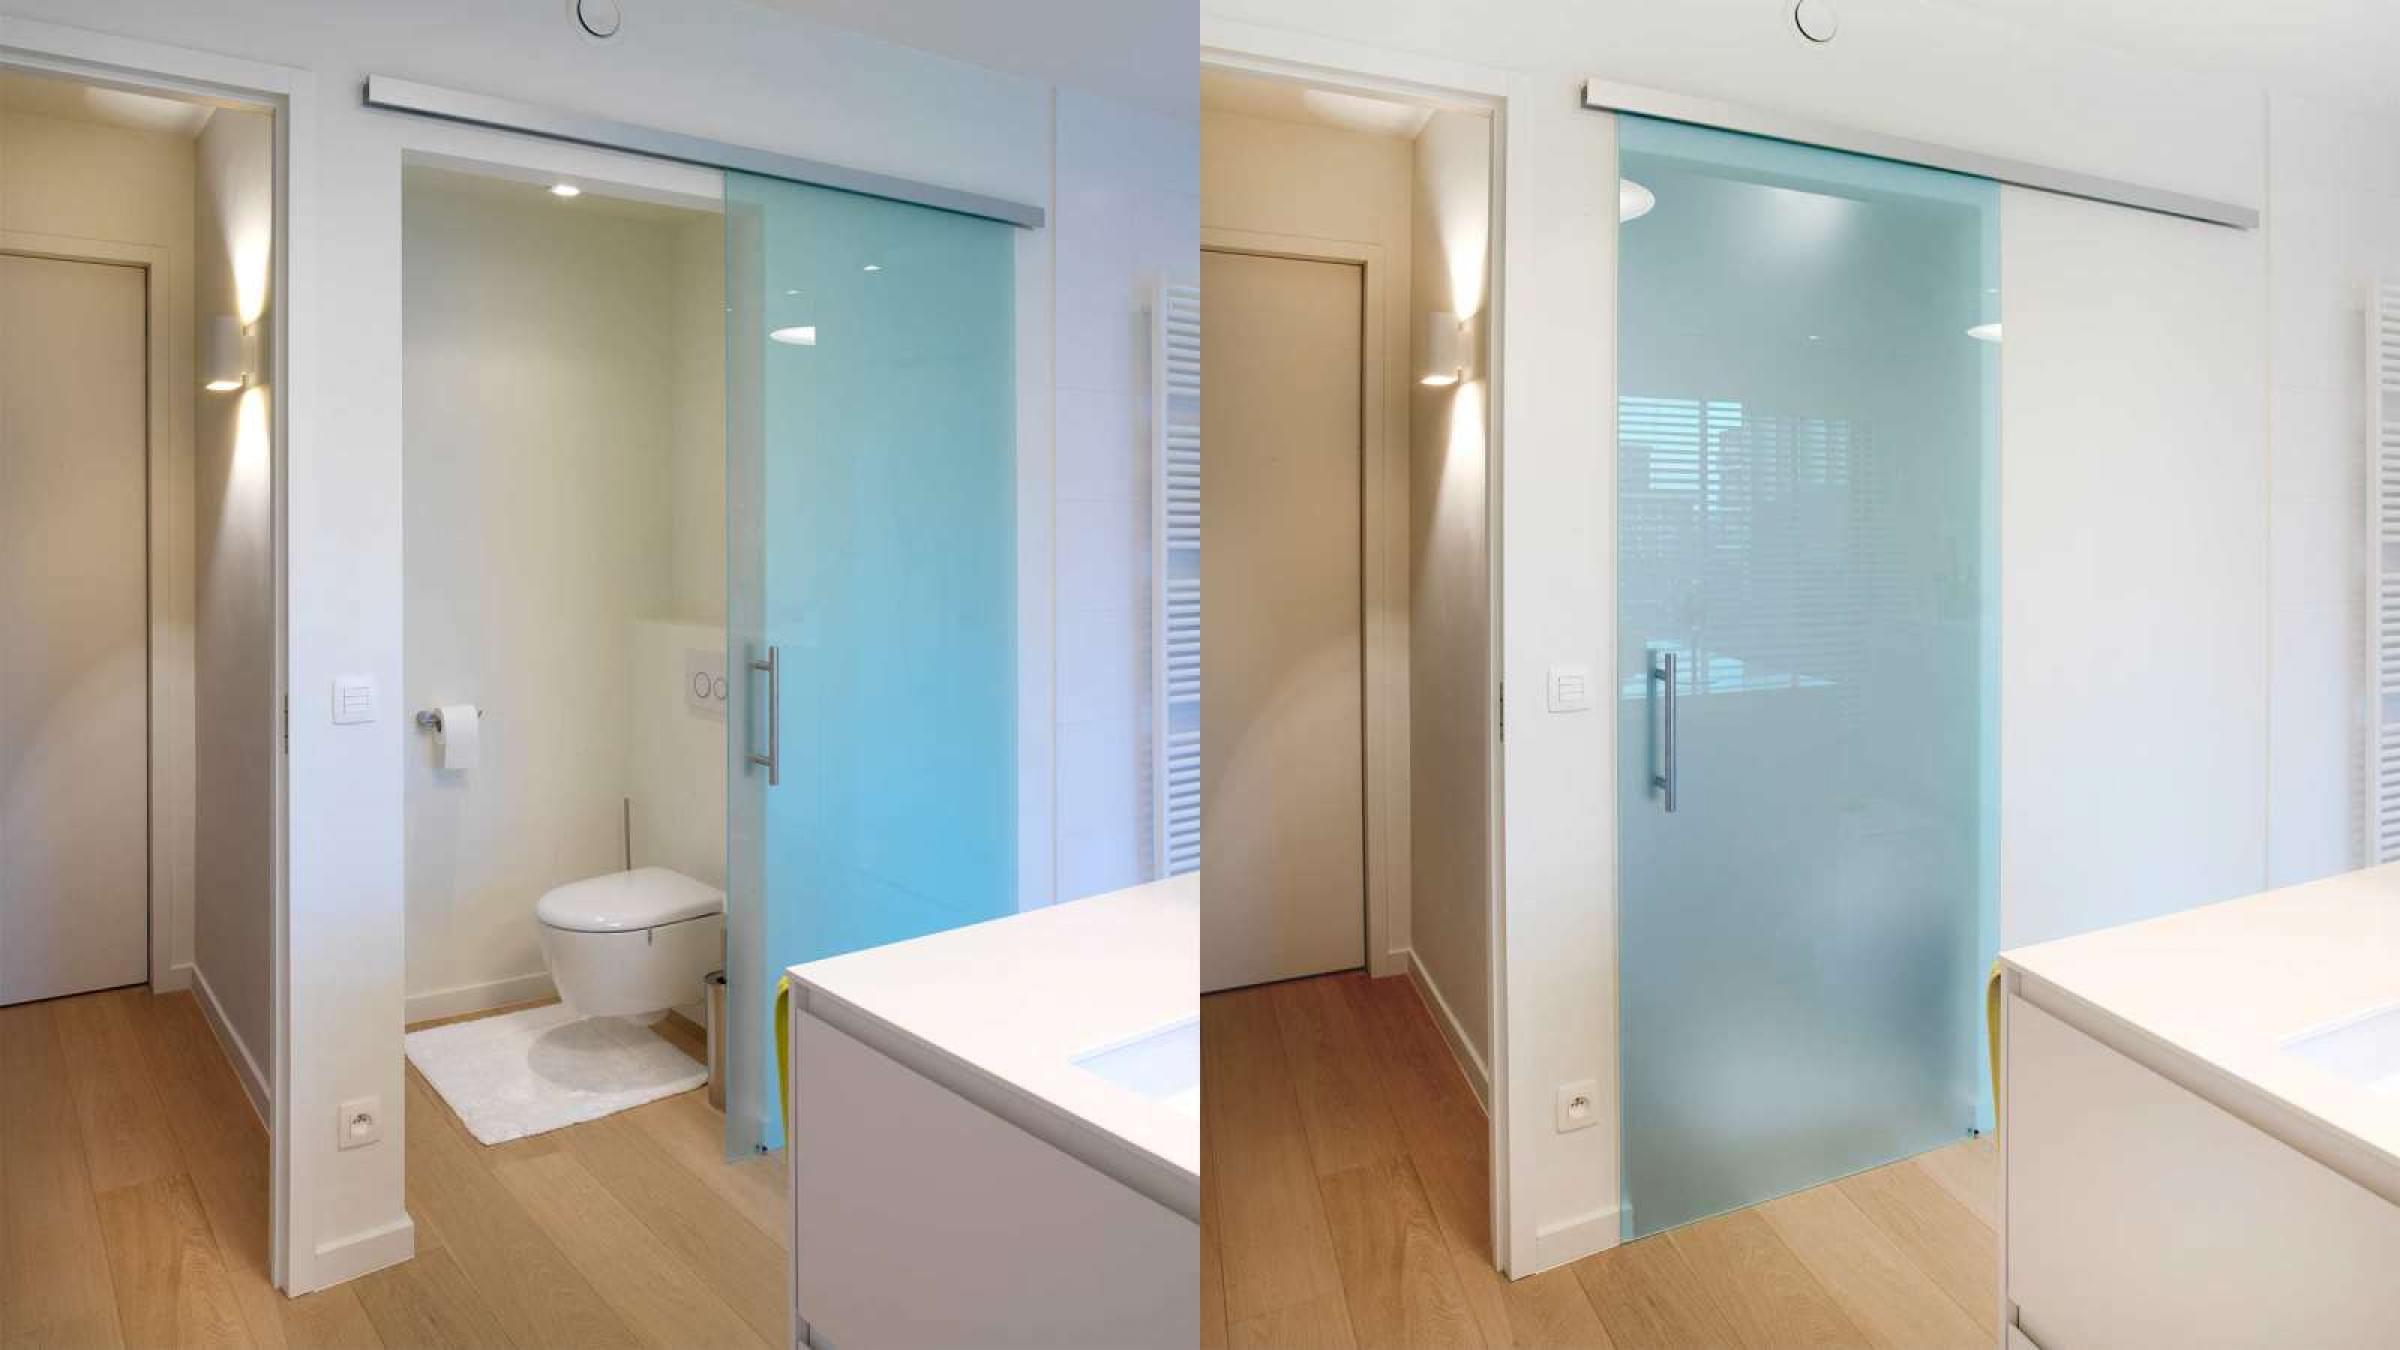 nordex-glazen-deuren-glazen-wand-2400